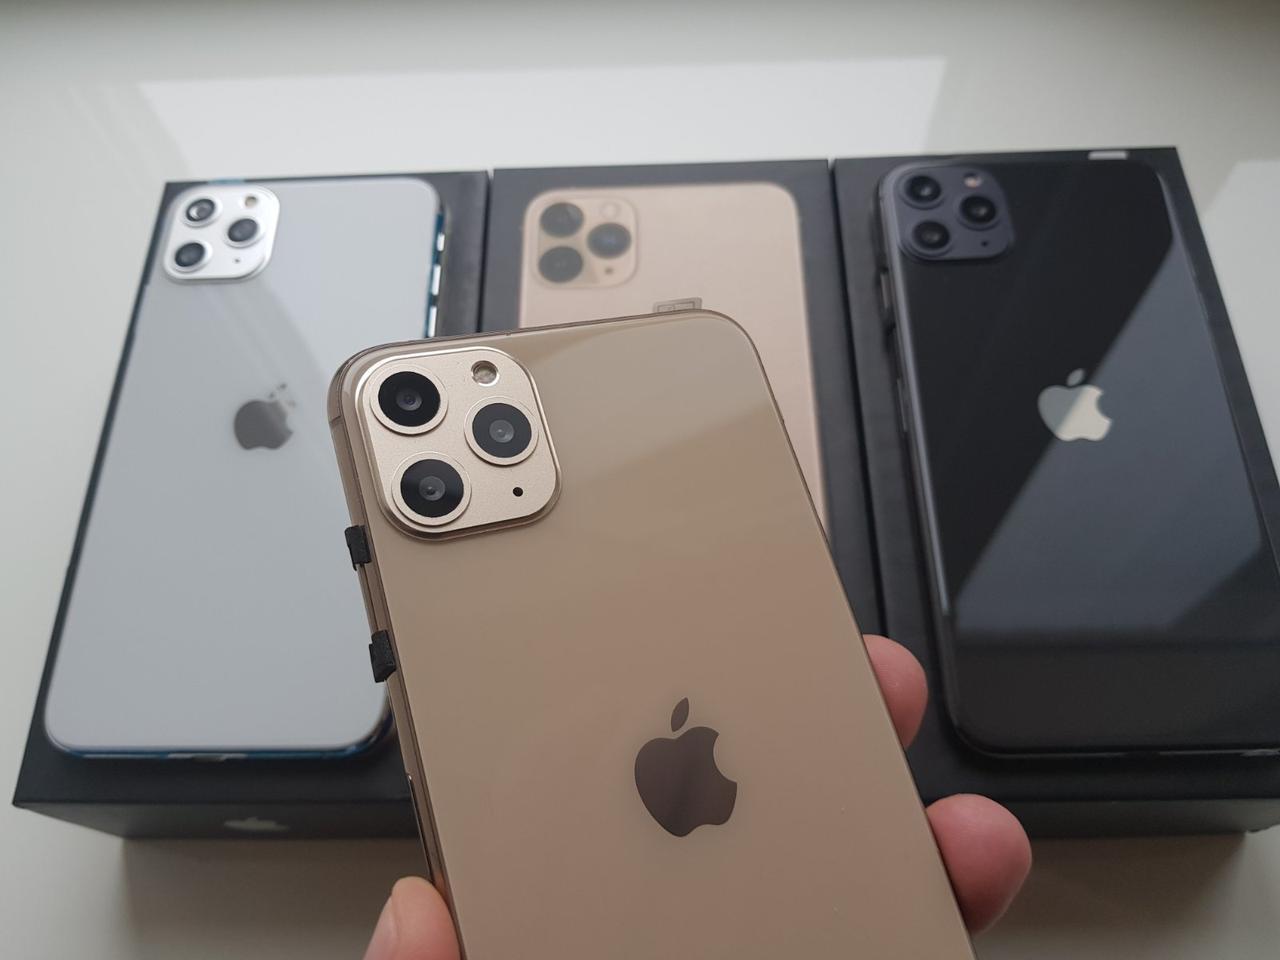 Новинка! Apple Iphone 11 PRO MAX 6.5! Копия! Все цвета! Без предоплаты!